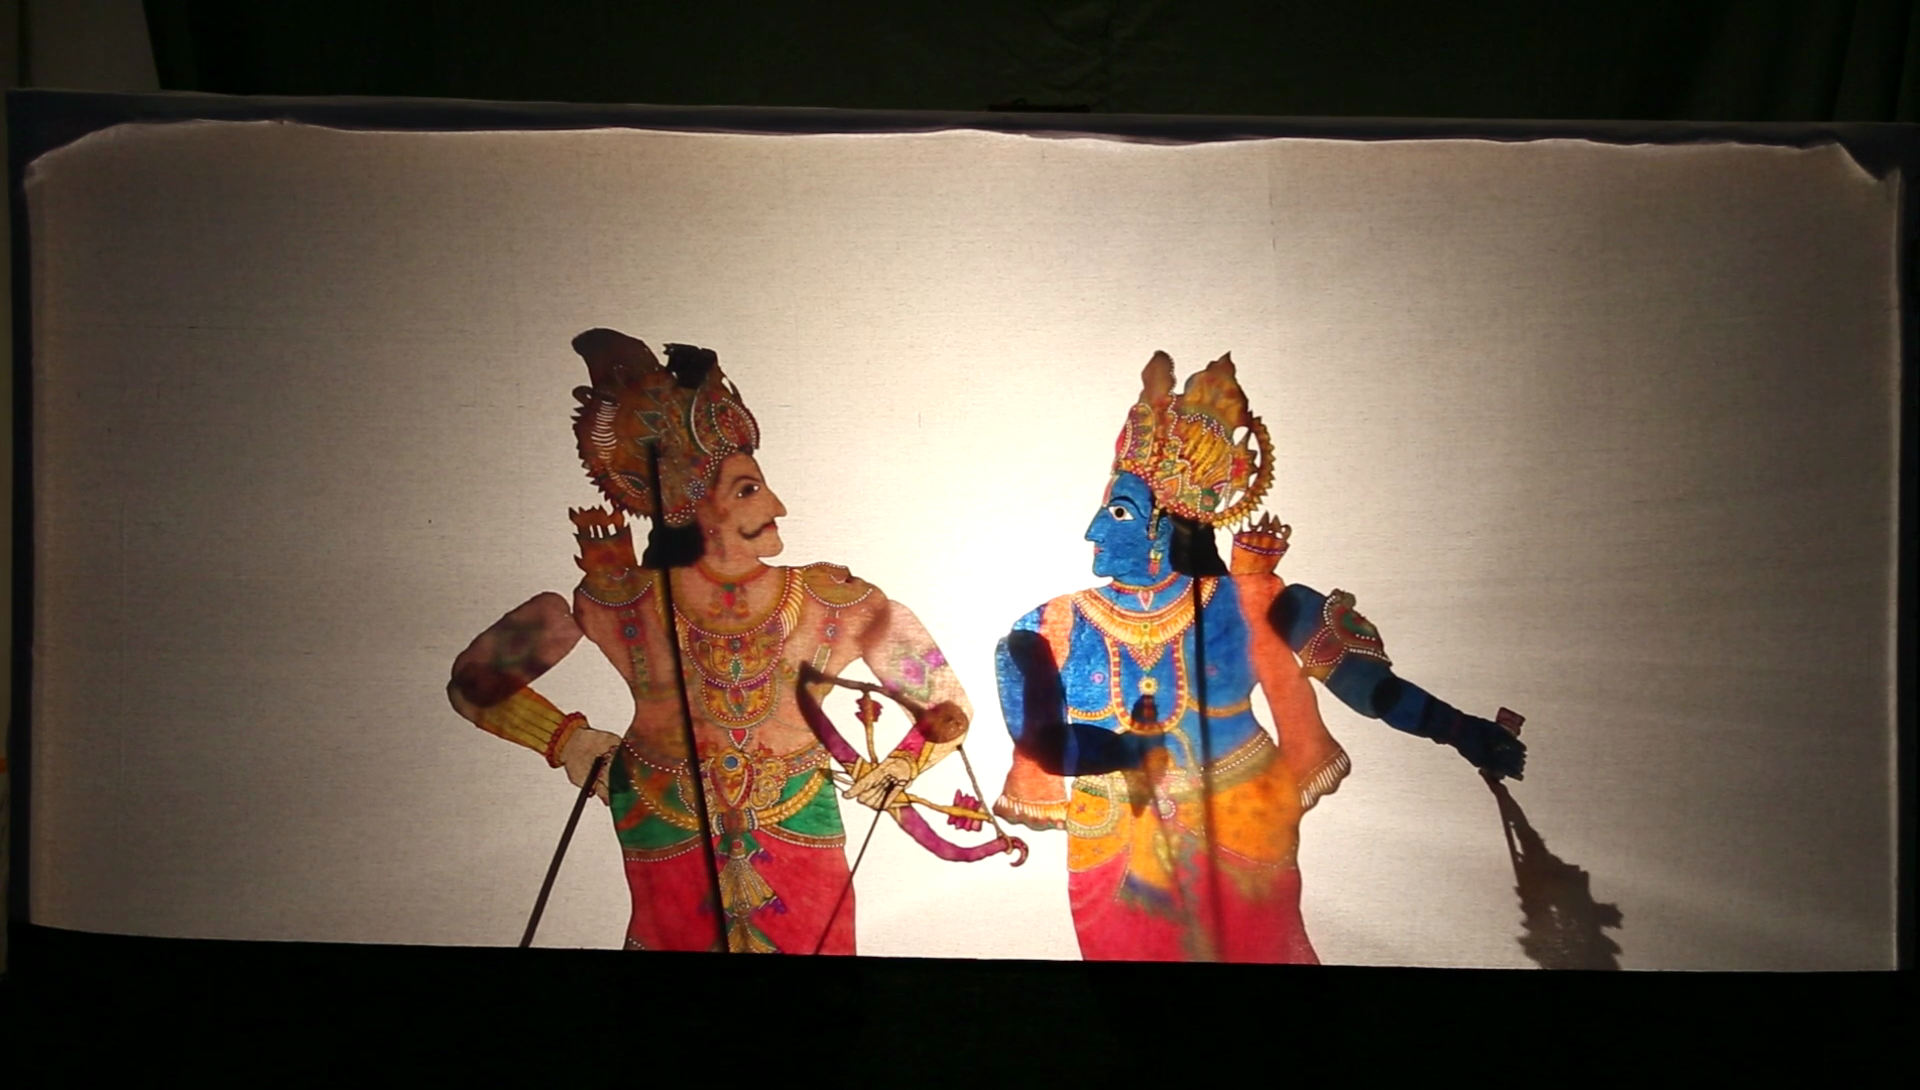 Krishna et Arjuna, dans une scène du Mahâbhârata, créée par Gunduraju (Hassan, Karnataka, Inde), un maître de théâtre d'ombres, togalu gombeya</em>ta</em>